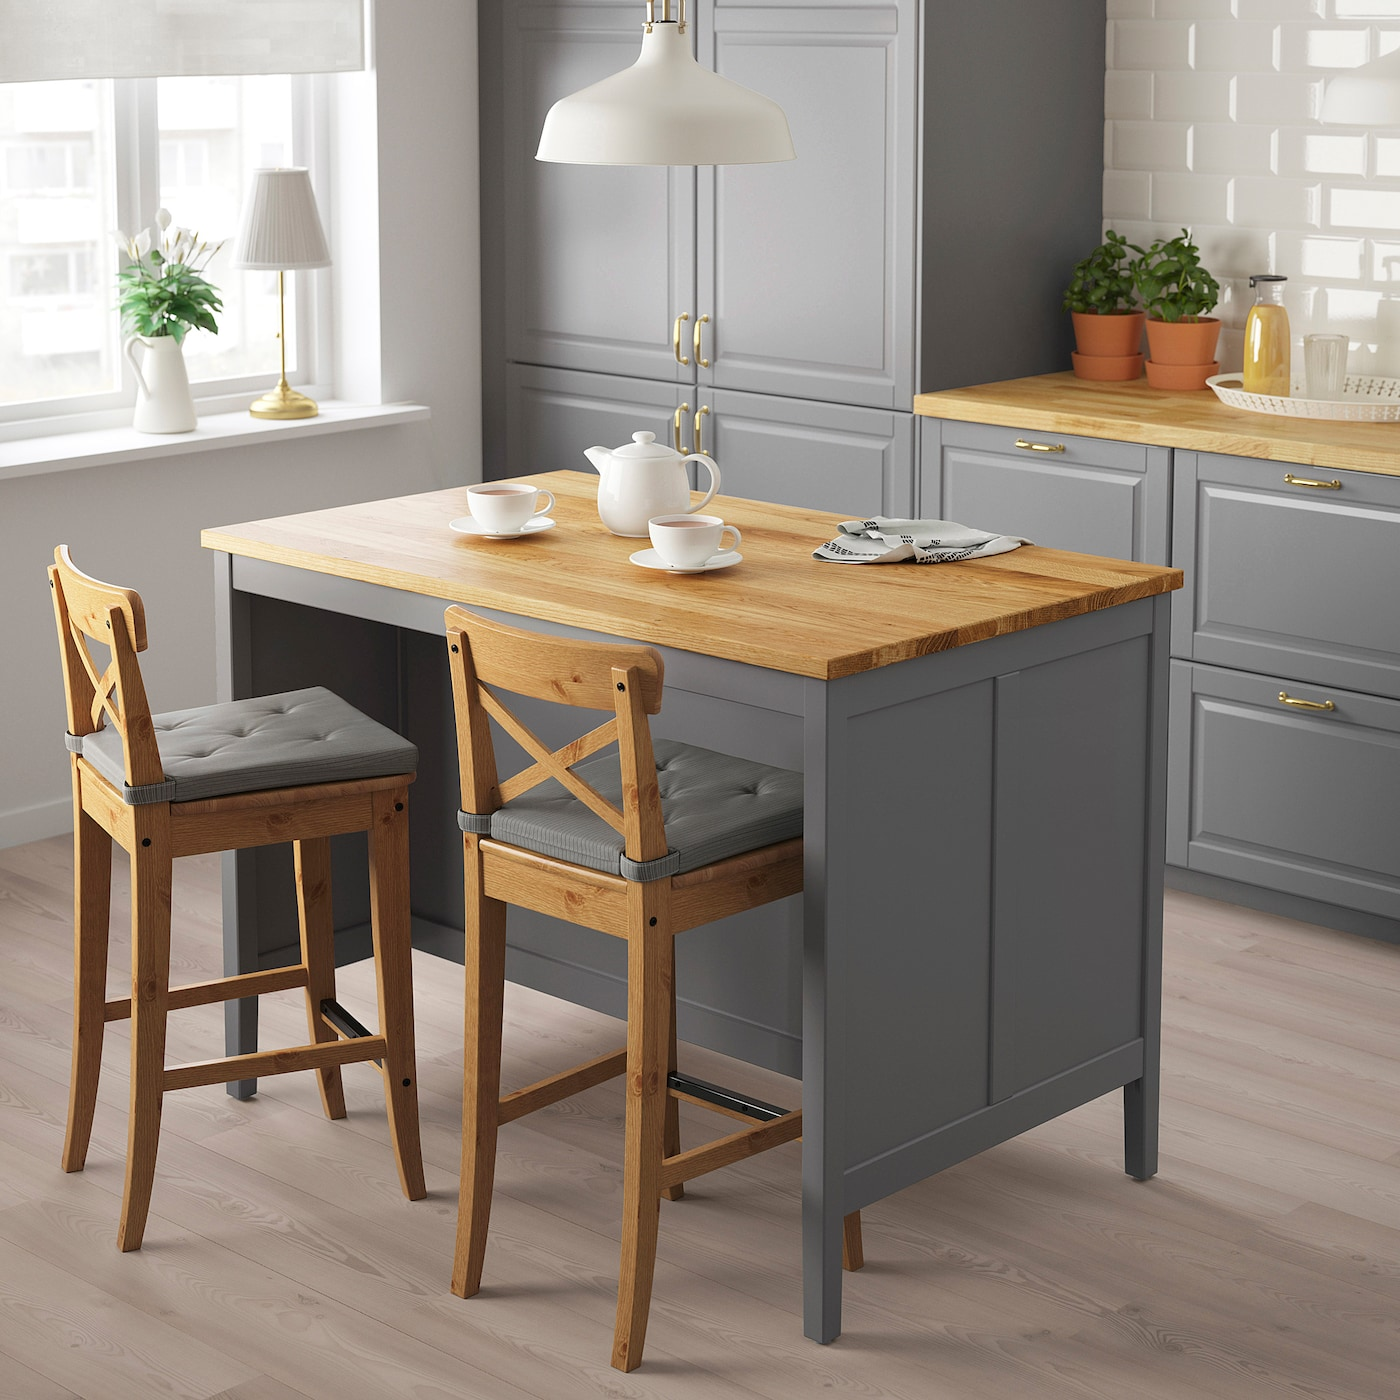 Kucheninsel Aus Ikea Mobeln   Best Home Ideas 2020   howtohomeinteriors